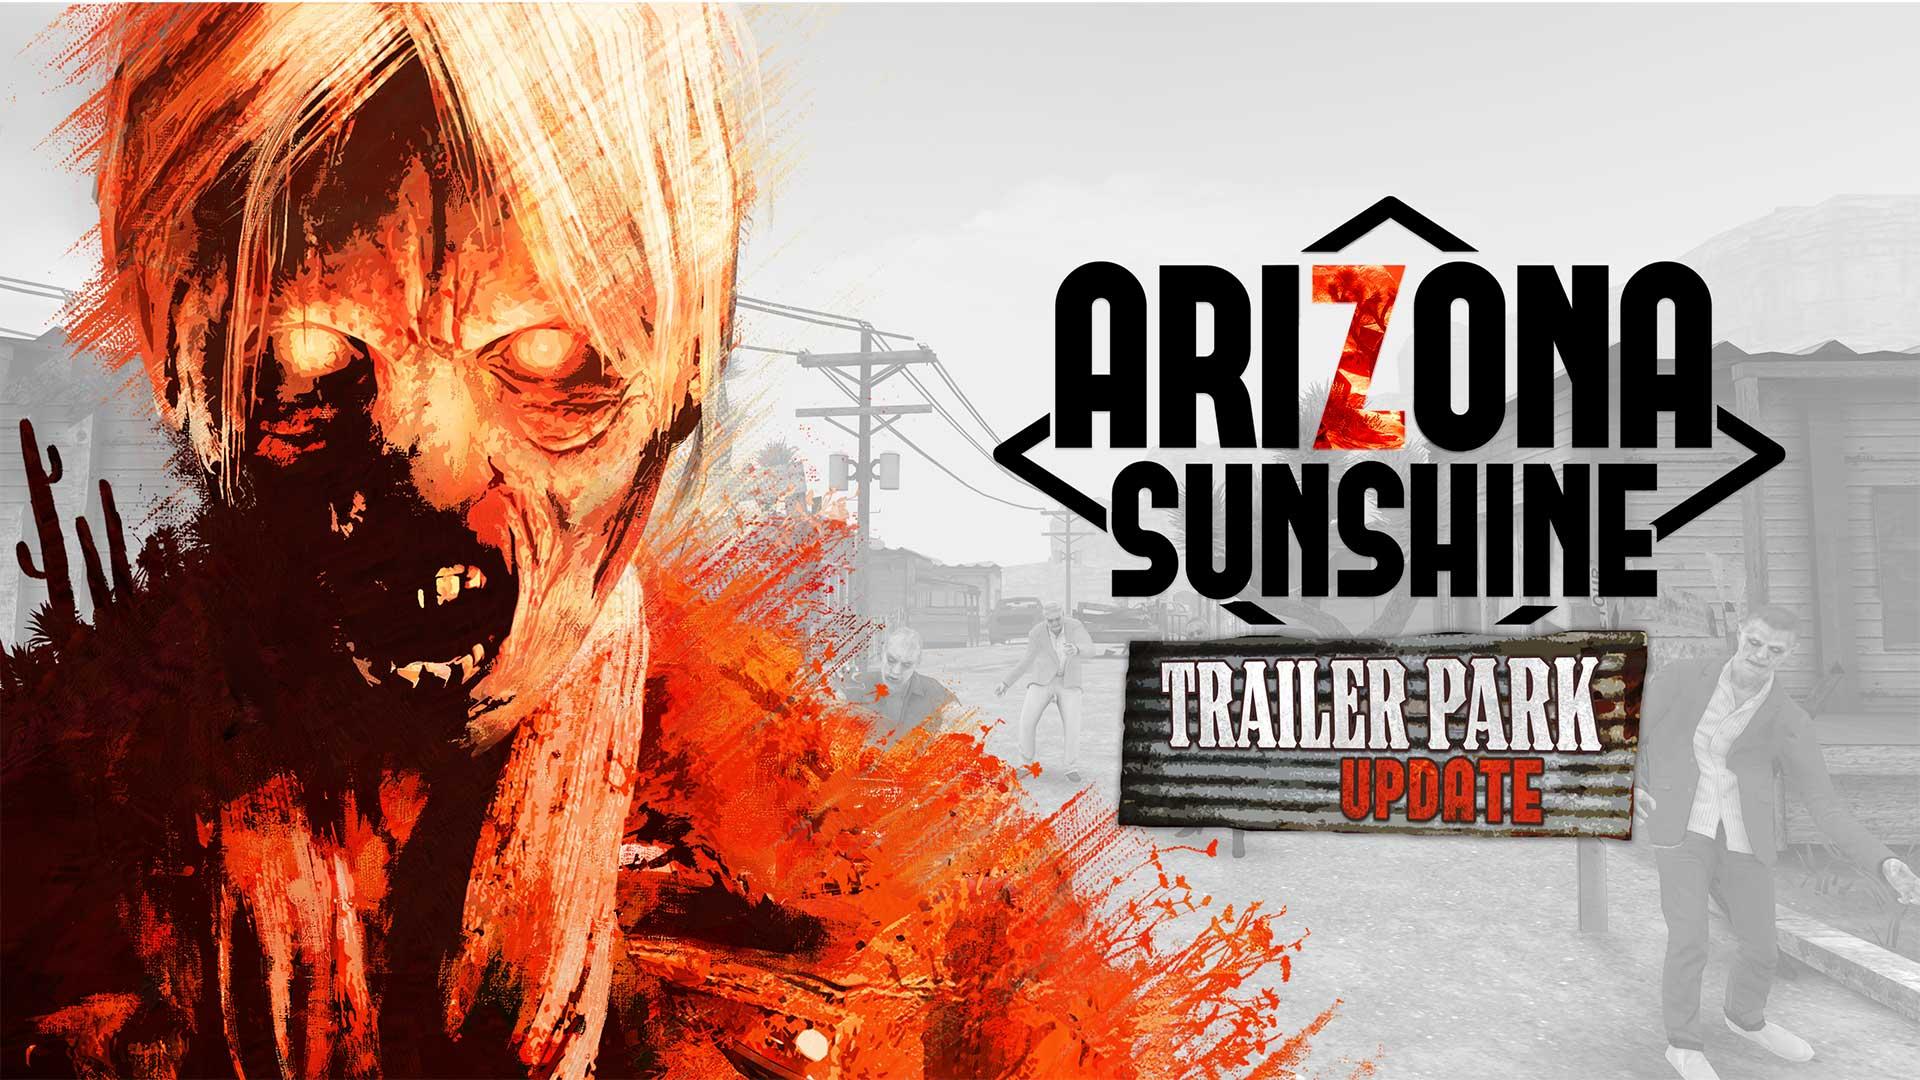 arizona sunshine trailer park update